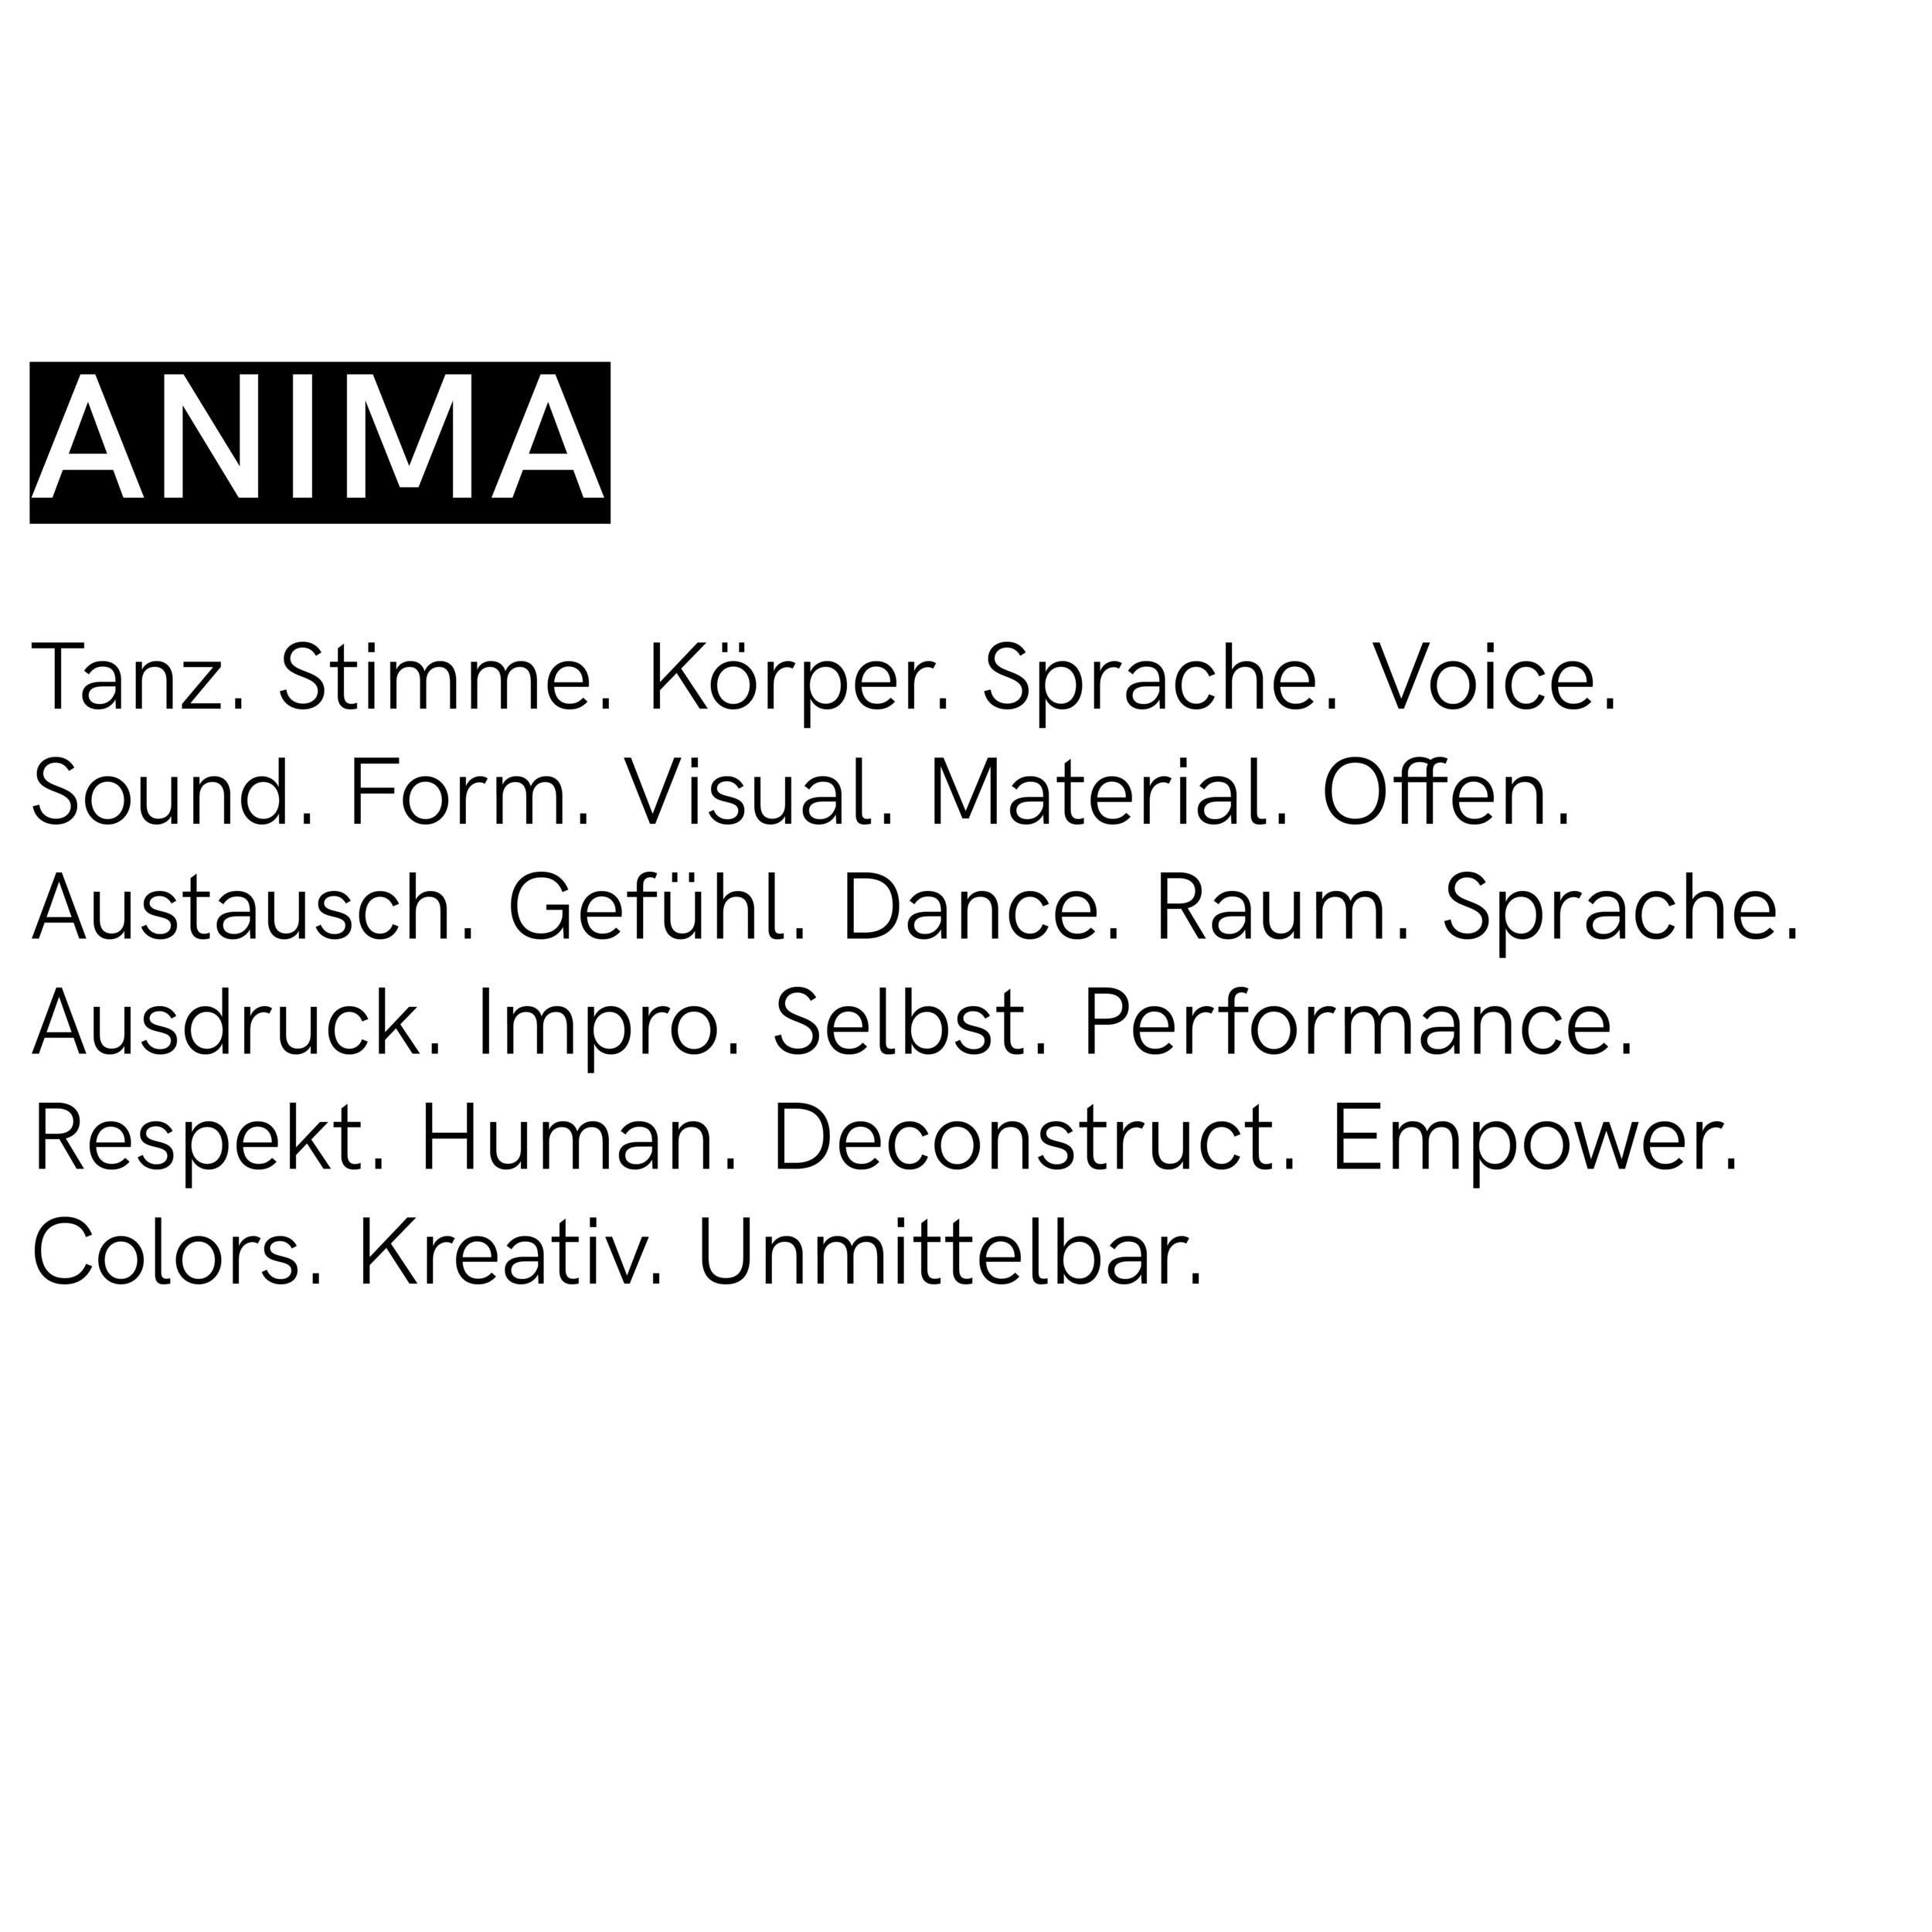 ANIMA_info_landingpage.jpg